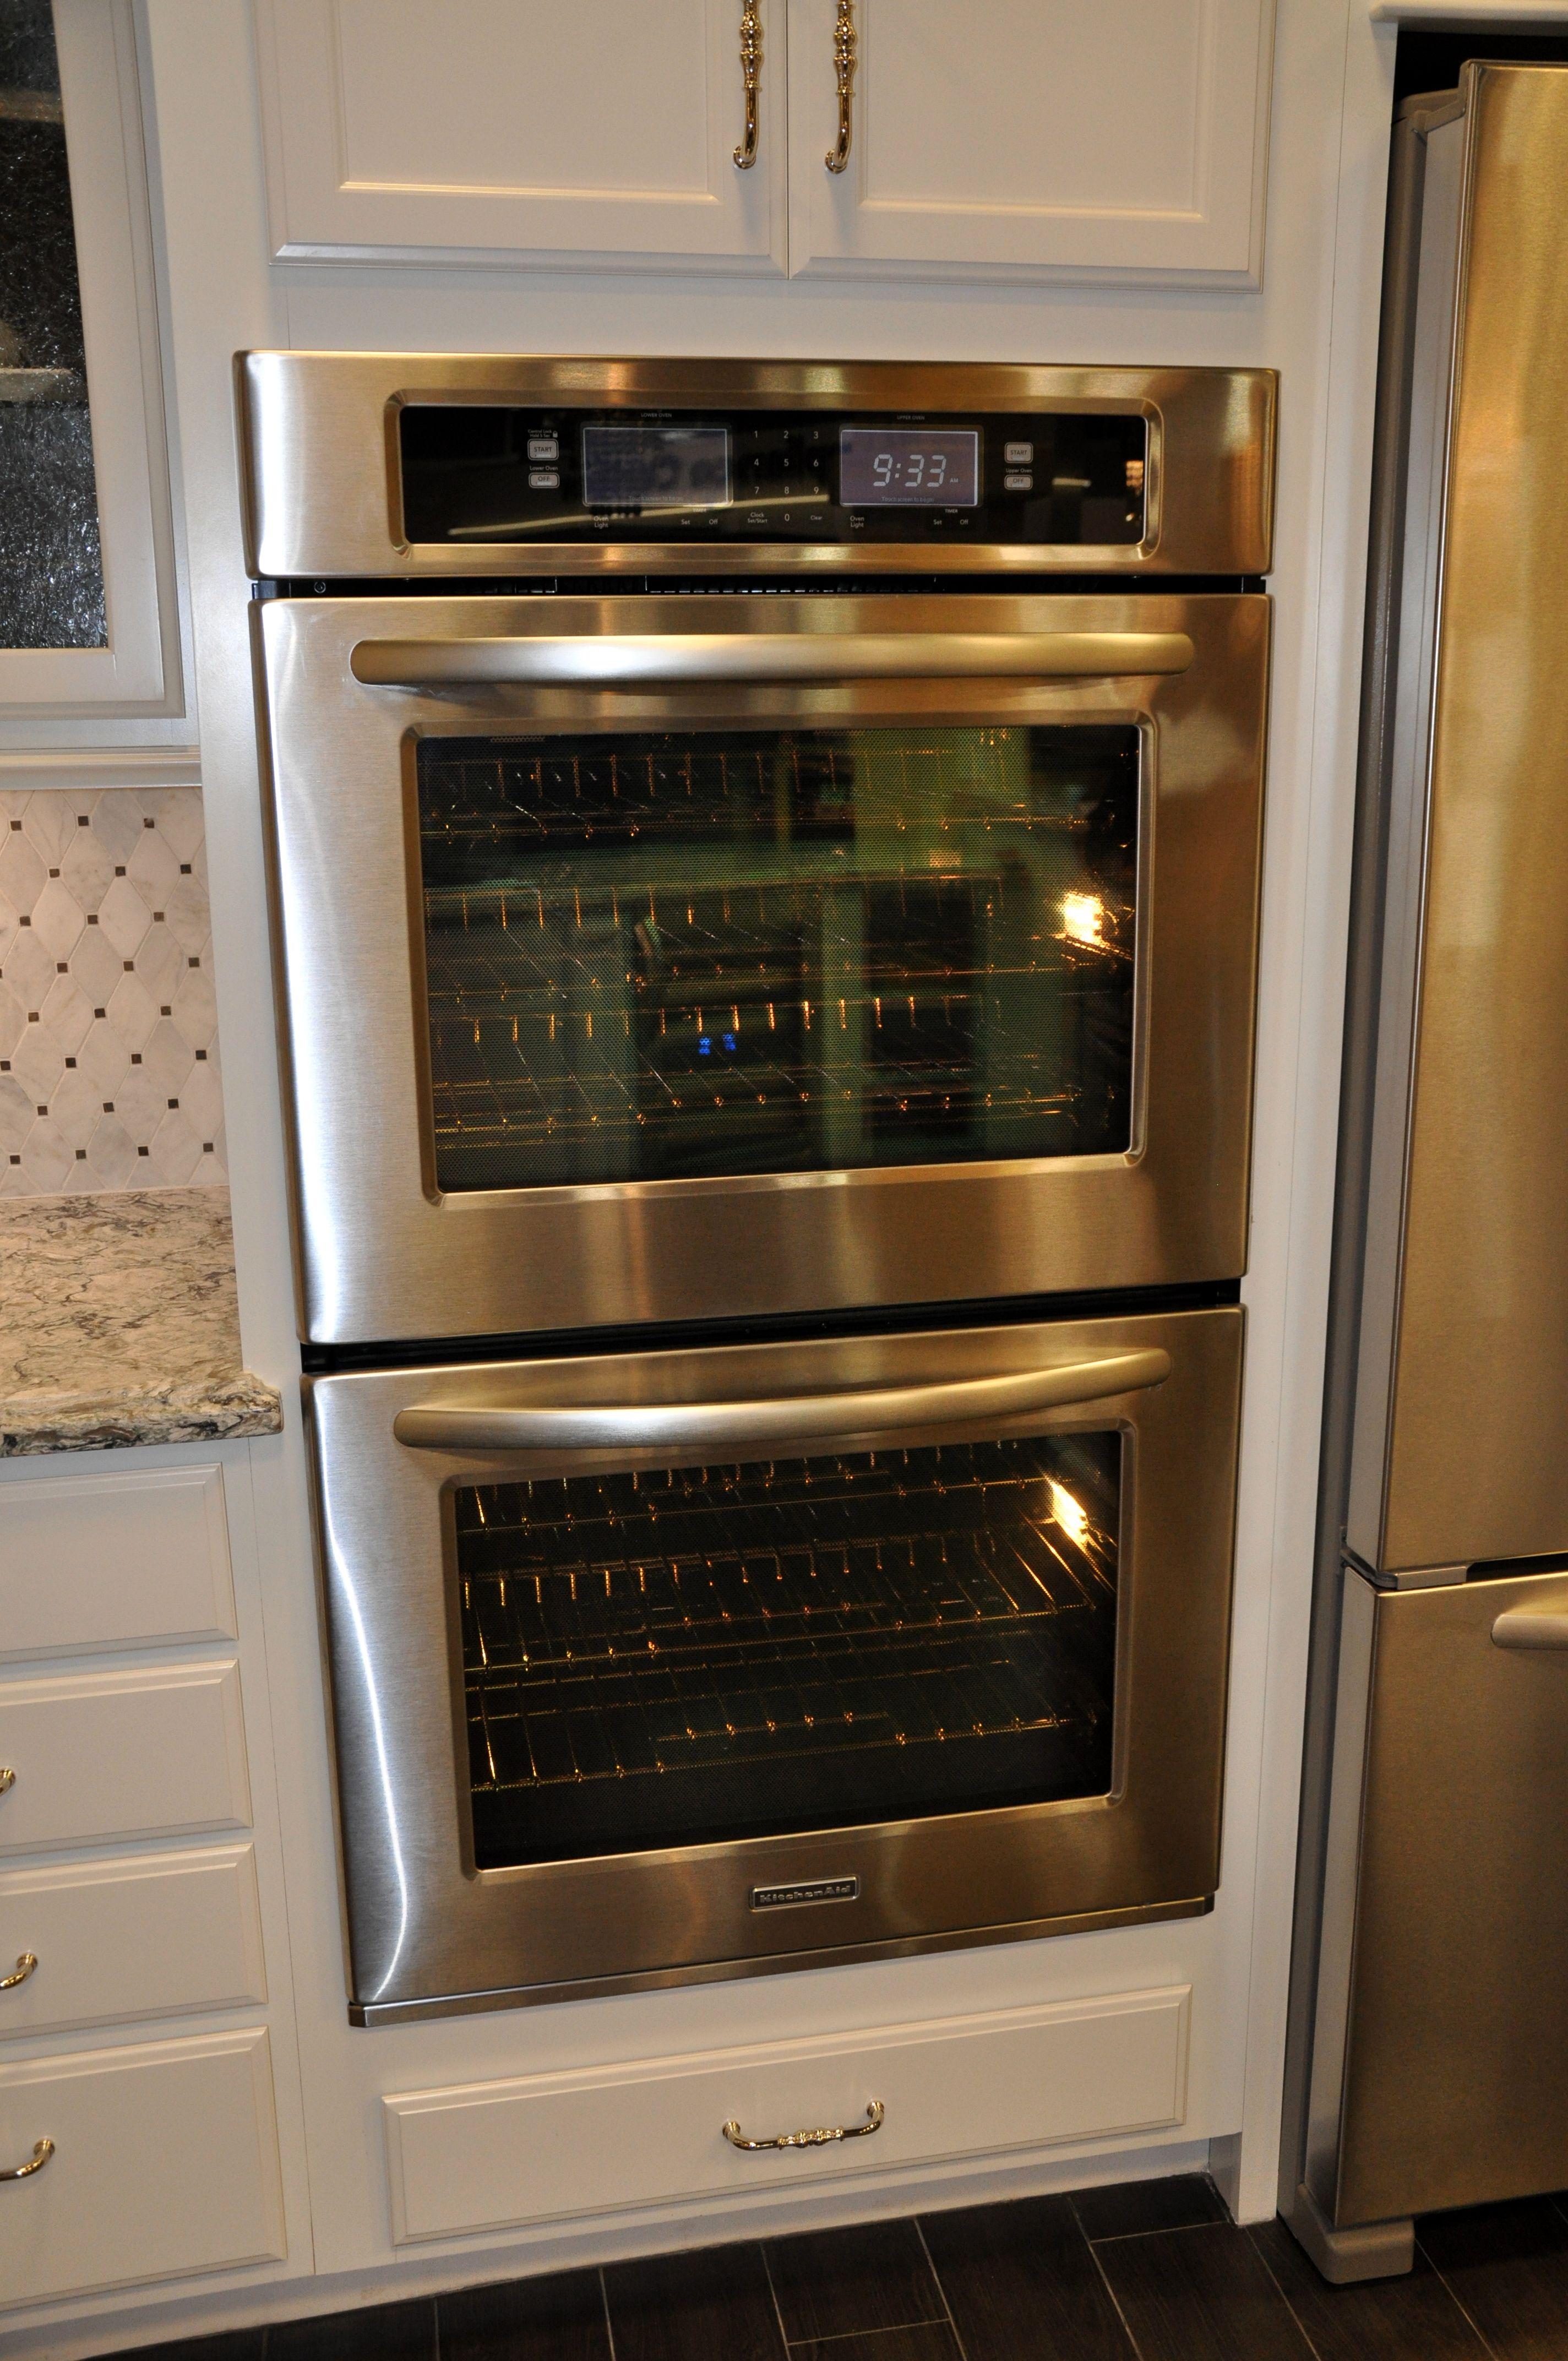 Kitchenaid Stainless Steel Double Steam Oven Chef Kitchenkitchen